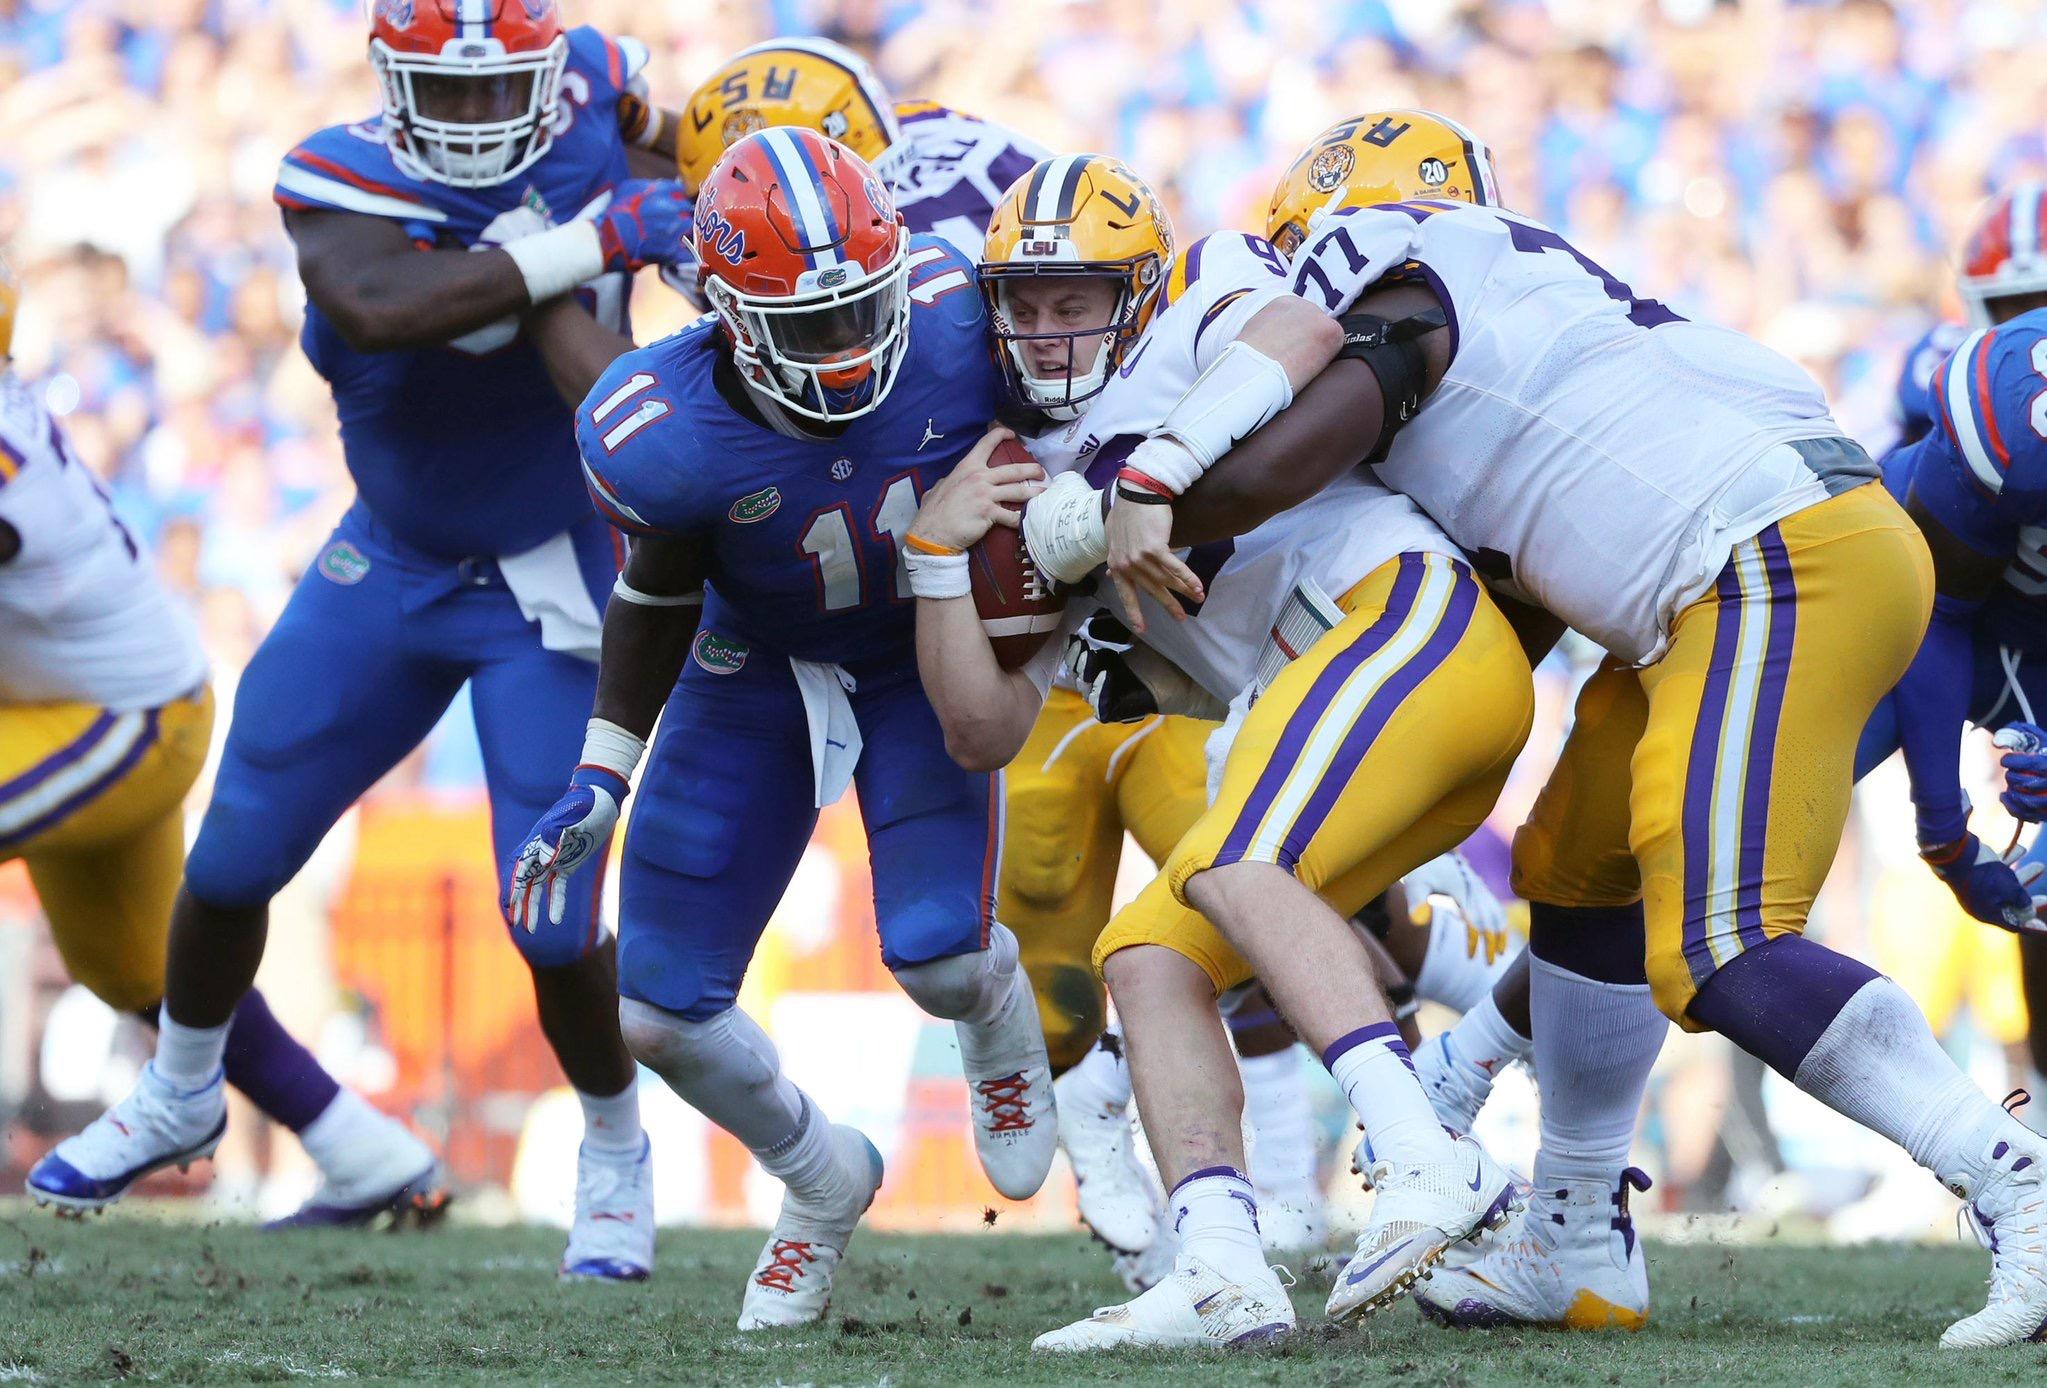 Football comes up short at The Swamp, 19-27